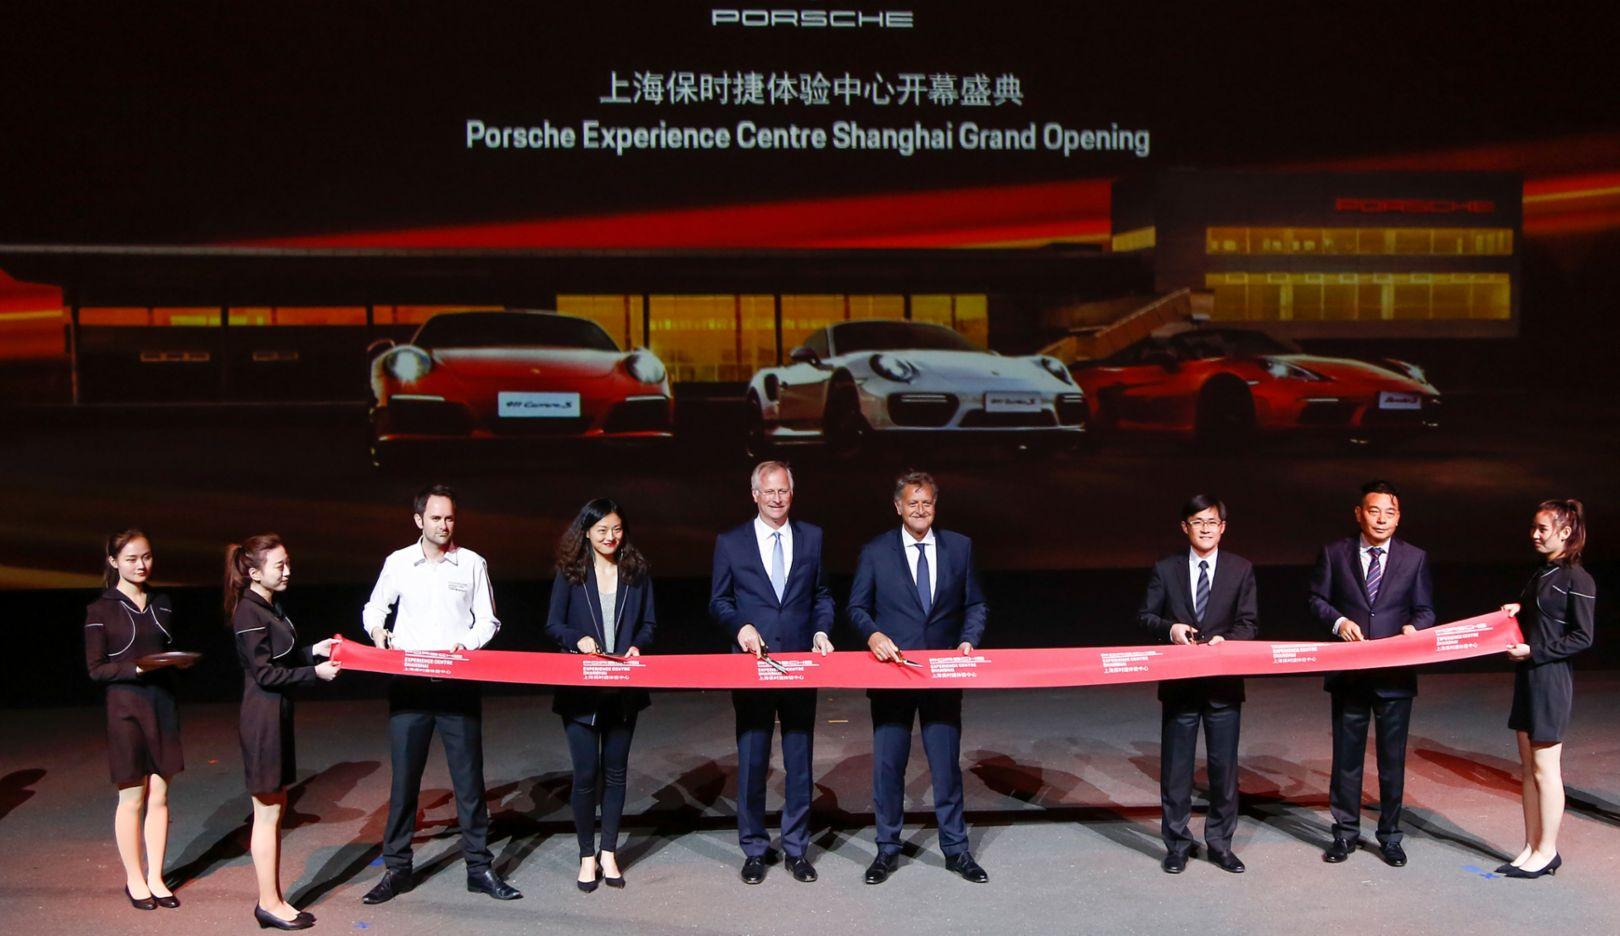 Jens Puttfarcken, future CEO Porsche China and Porsche Hongkong, Detlev von Platen, Member of the Executive Board, Sales and Marketing at Porsche, Opening Porsche Experience Center Shanghai, 2018, Porsche AG